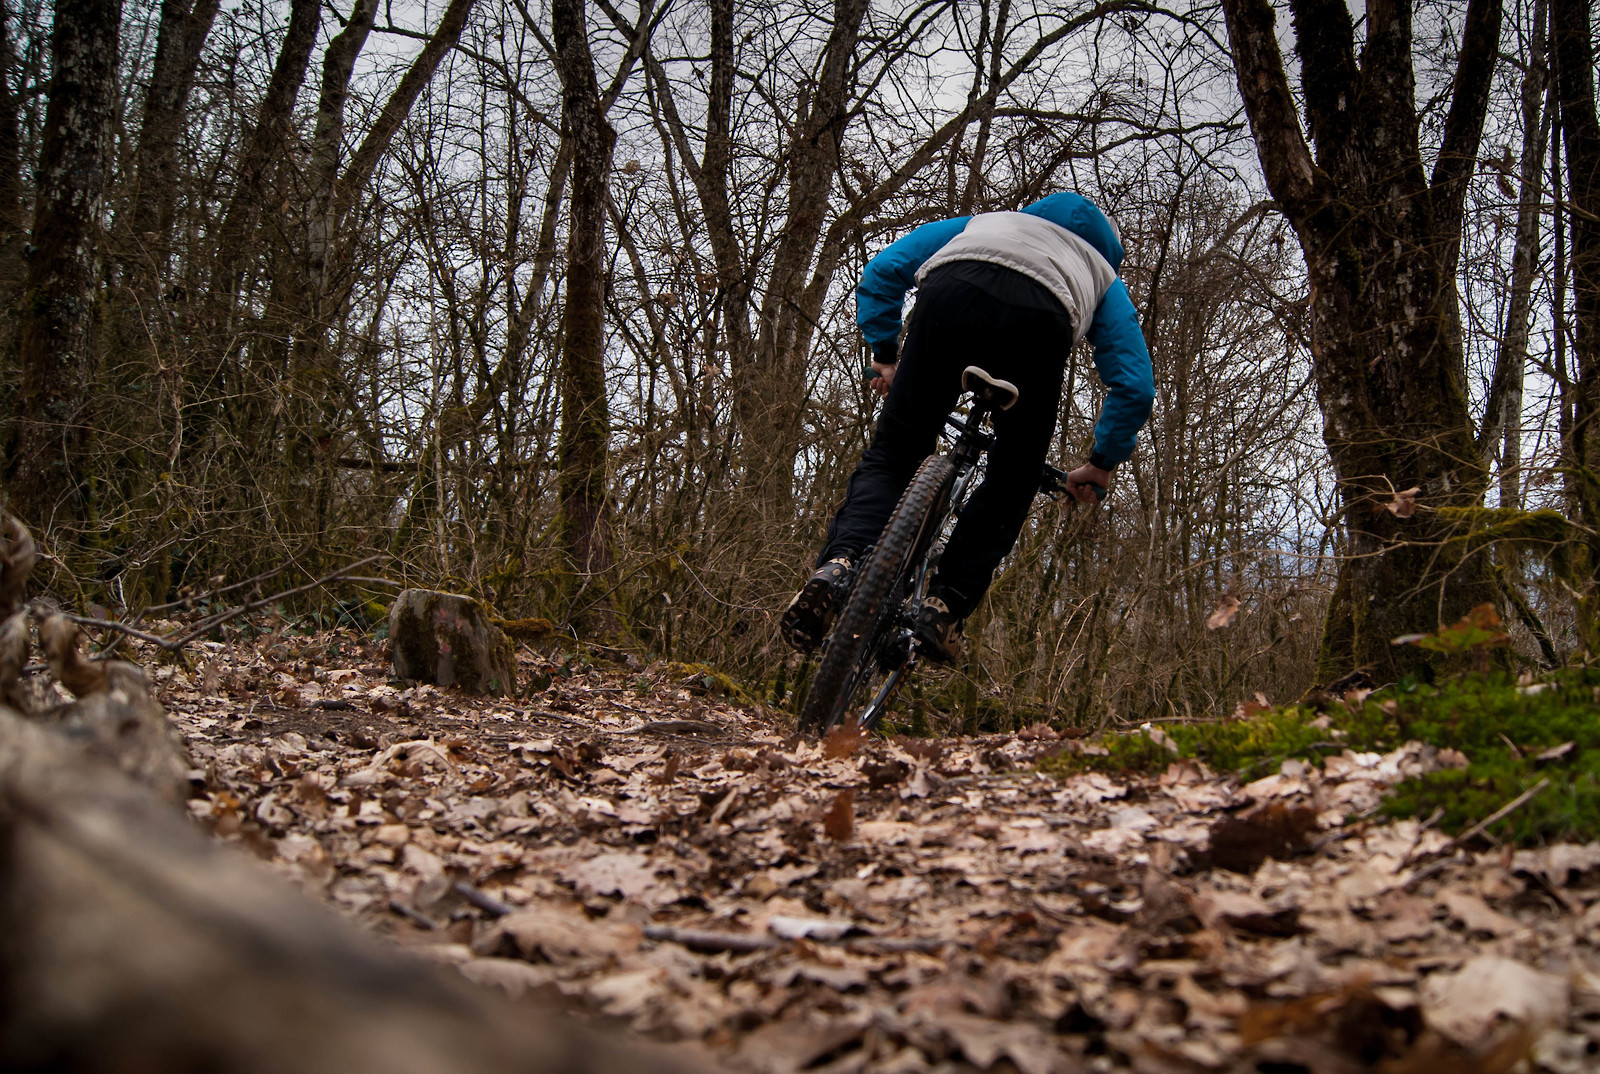 DSC04283 - Romain_Bordon - Mountain Biking Pictures - Vital MTB